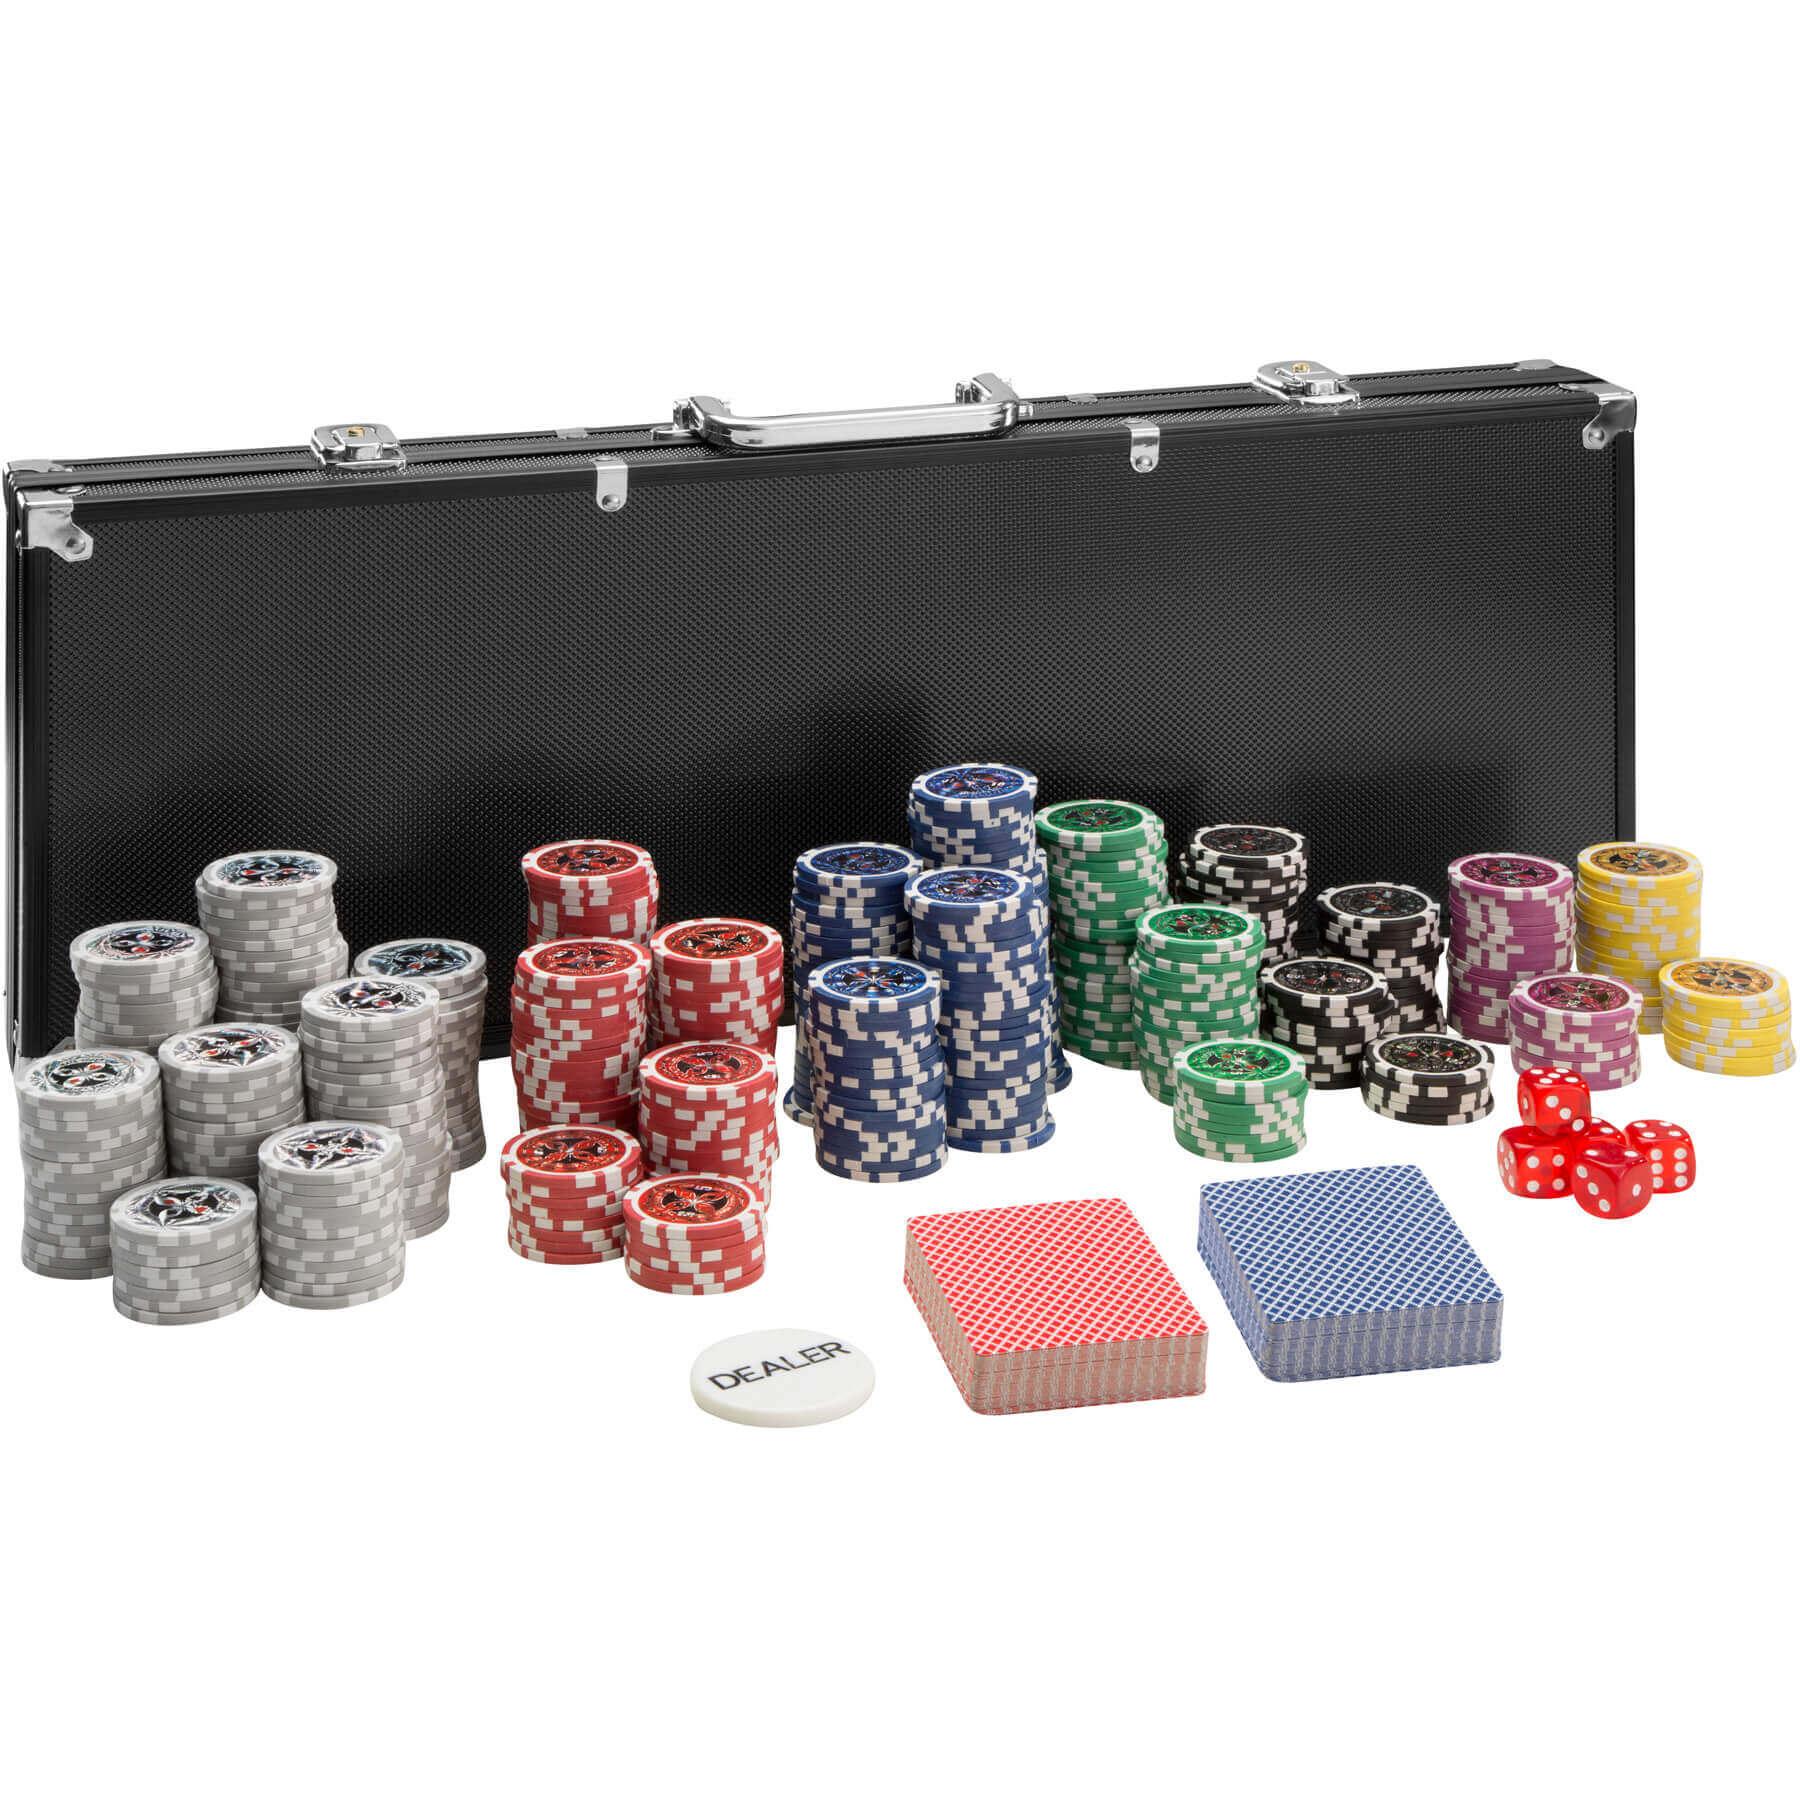 tectake Pokersæt - sort, 500 dele